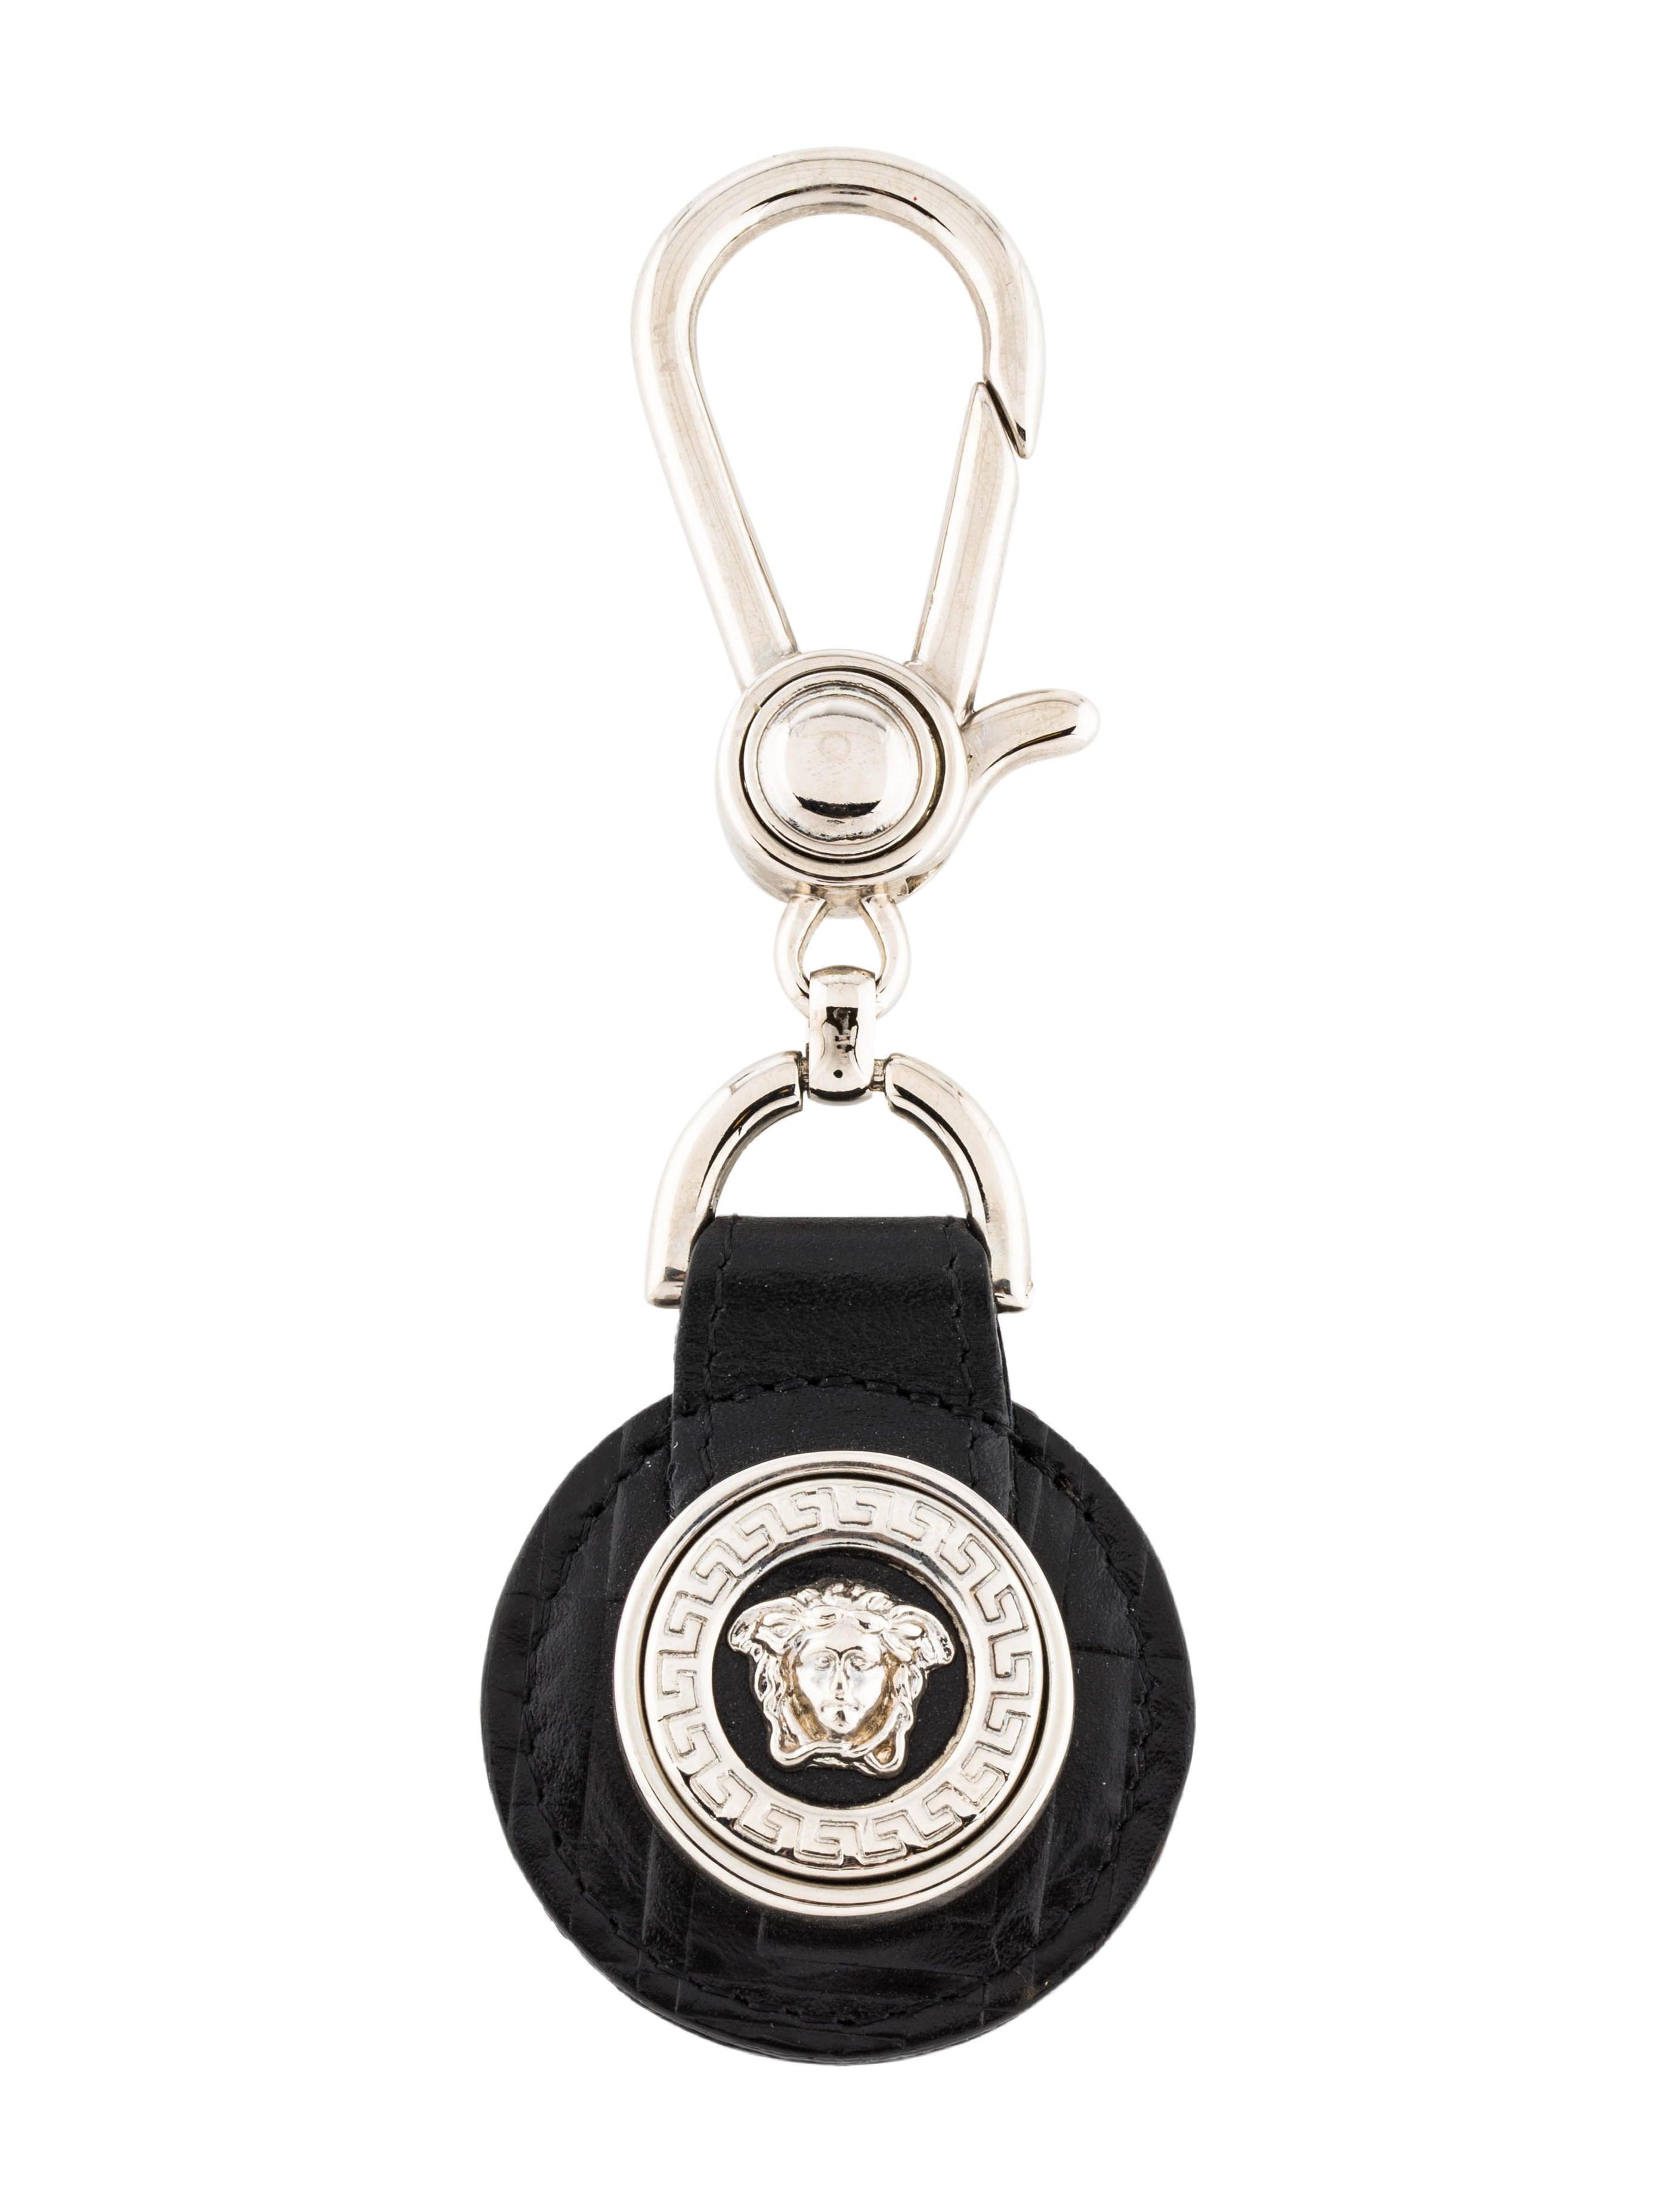 e1f0e89af1ea Gianni Versace Medusa Leather Bag Charm - Accessories - GVE23433 ...